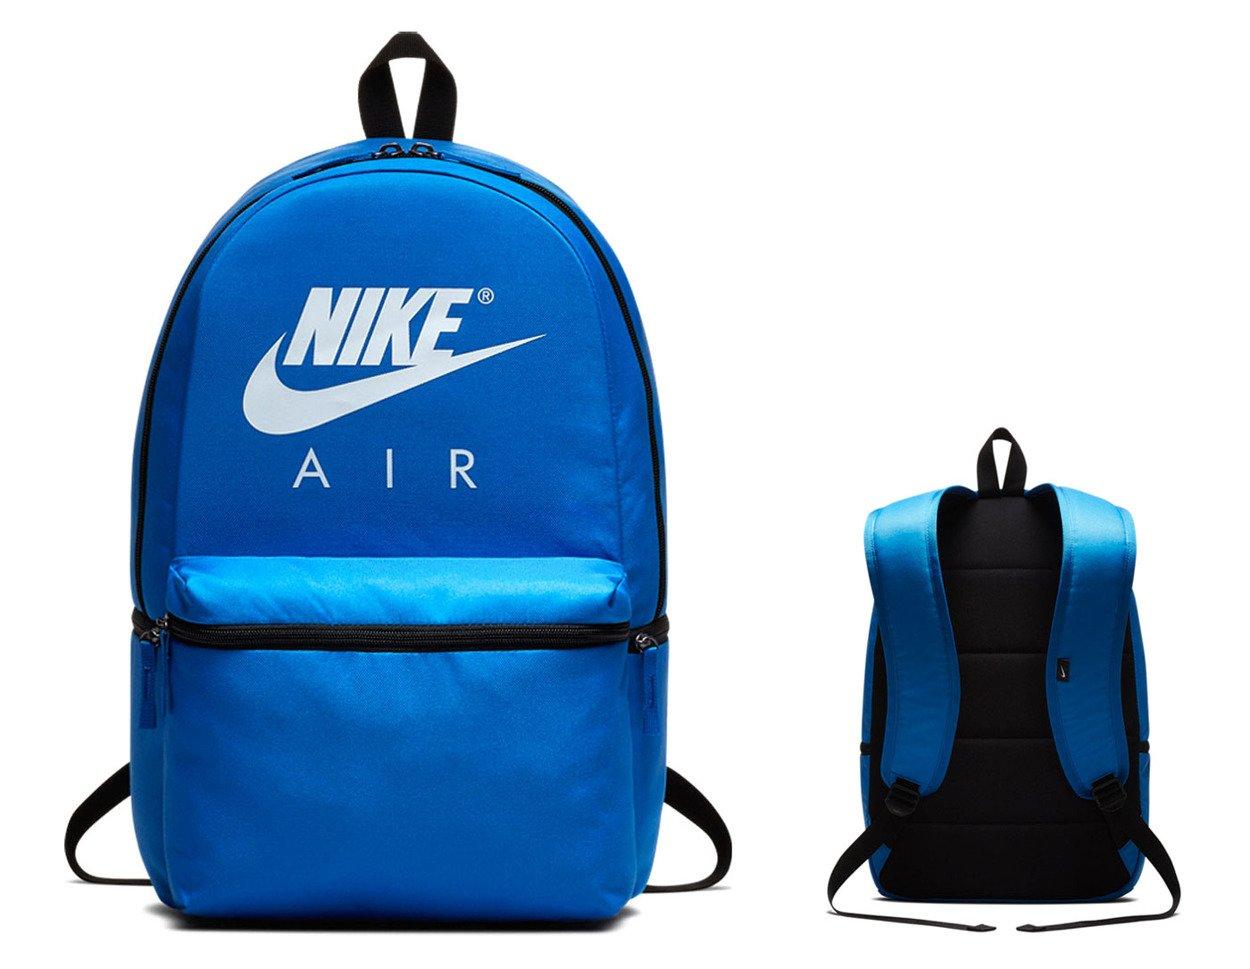 929ef860a1755 ... Niebieski plecak szkolny Nike Air Backpack BA5777-403 ...